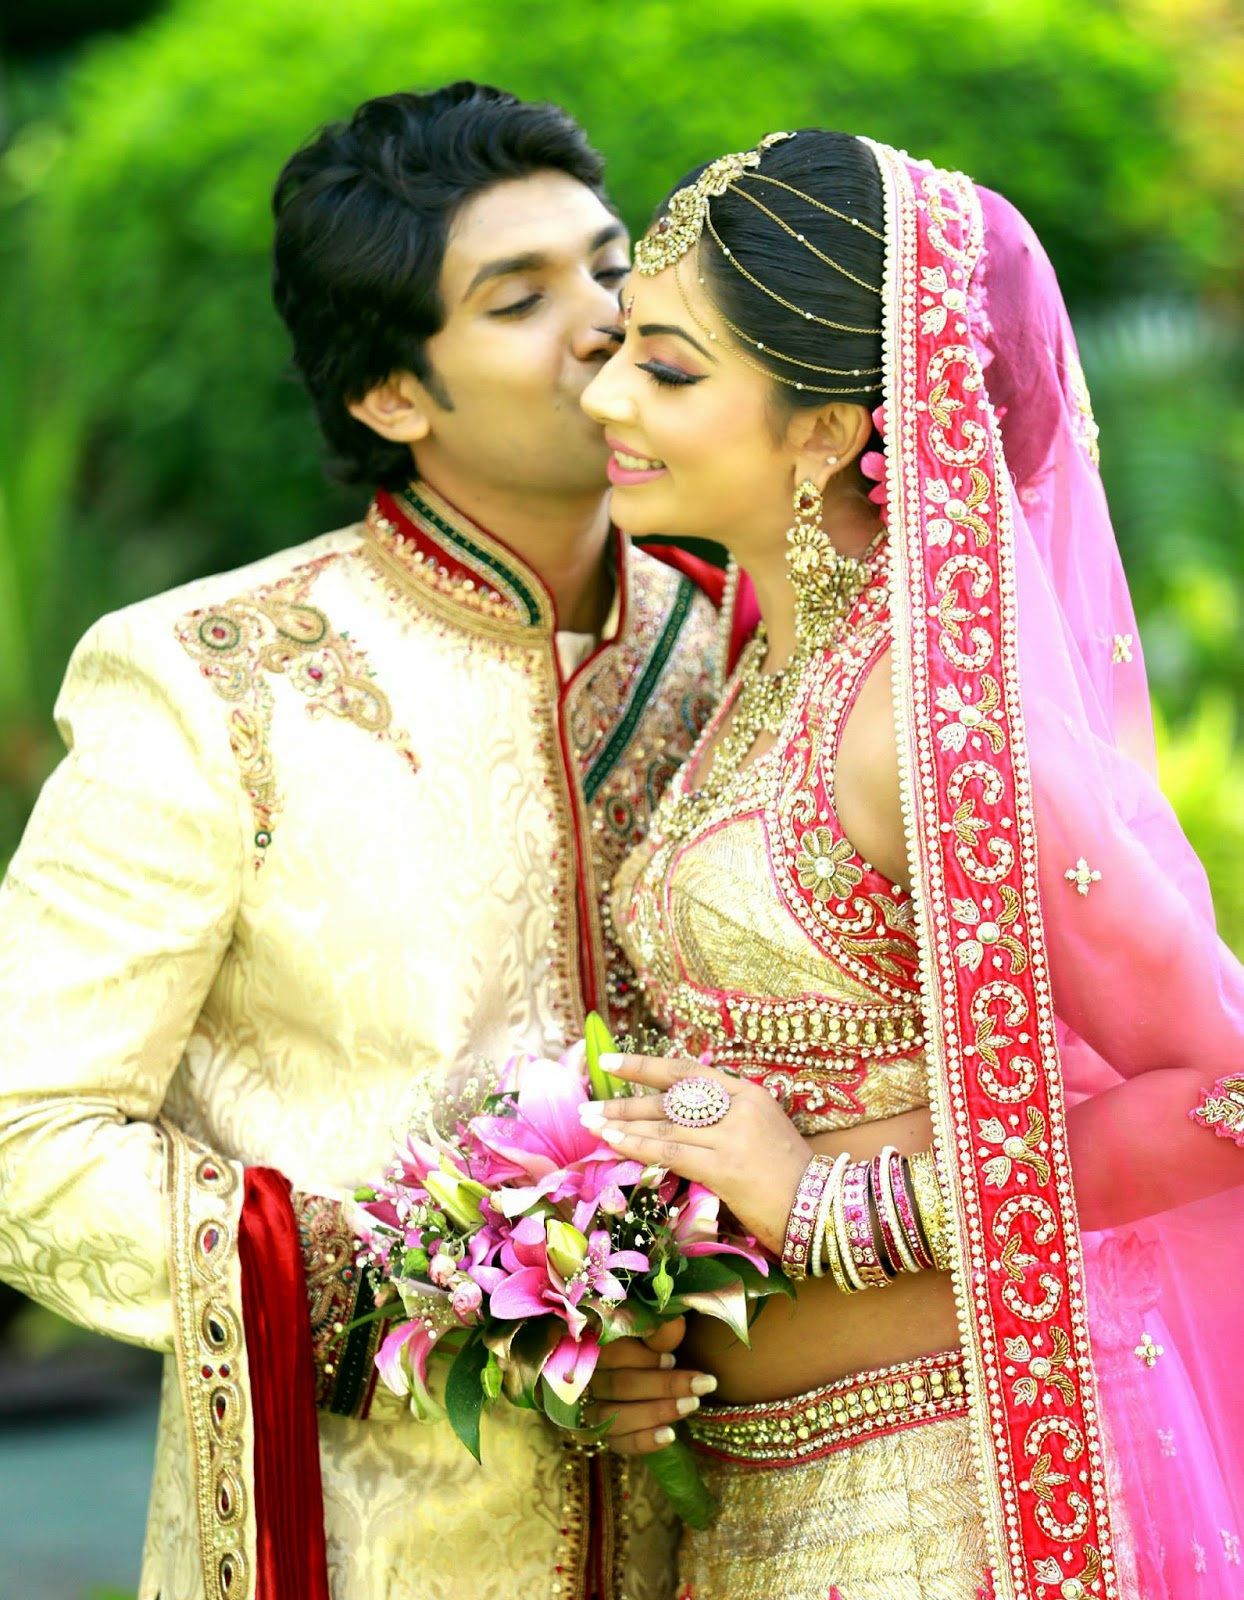 Dressed by Aruni Bridals